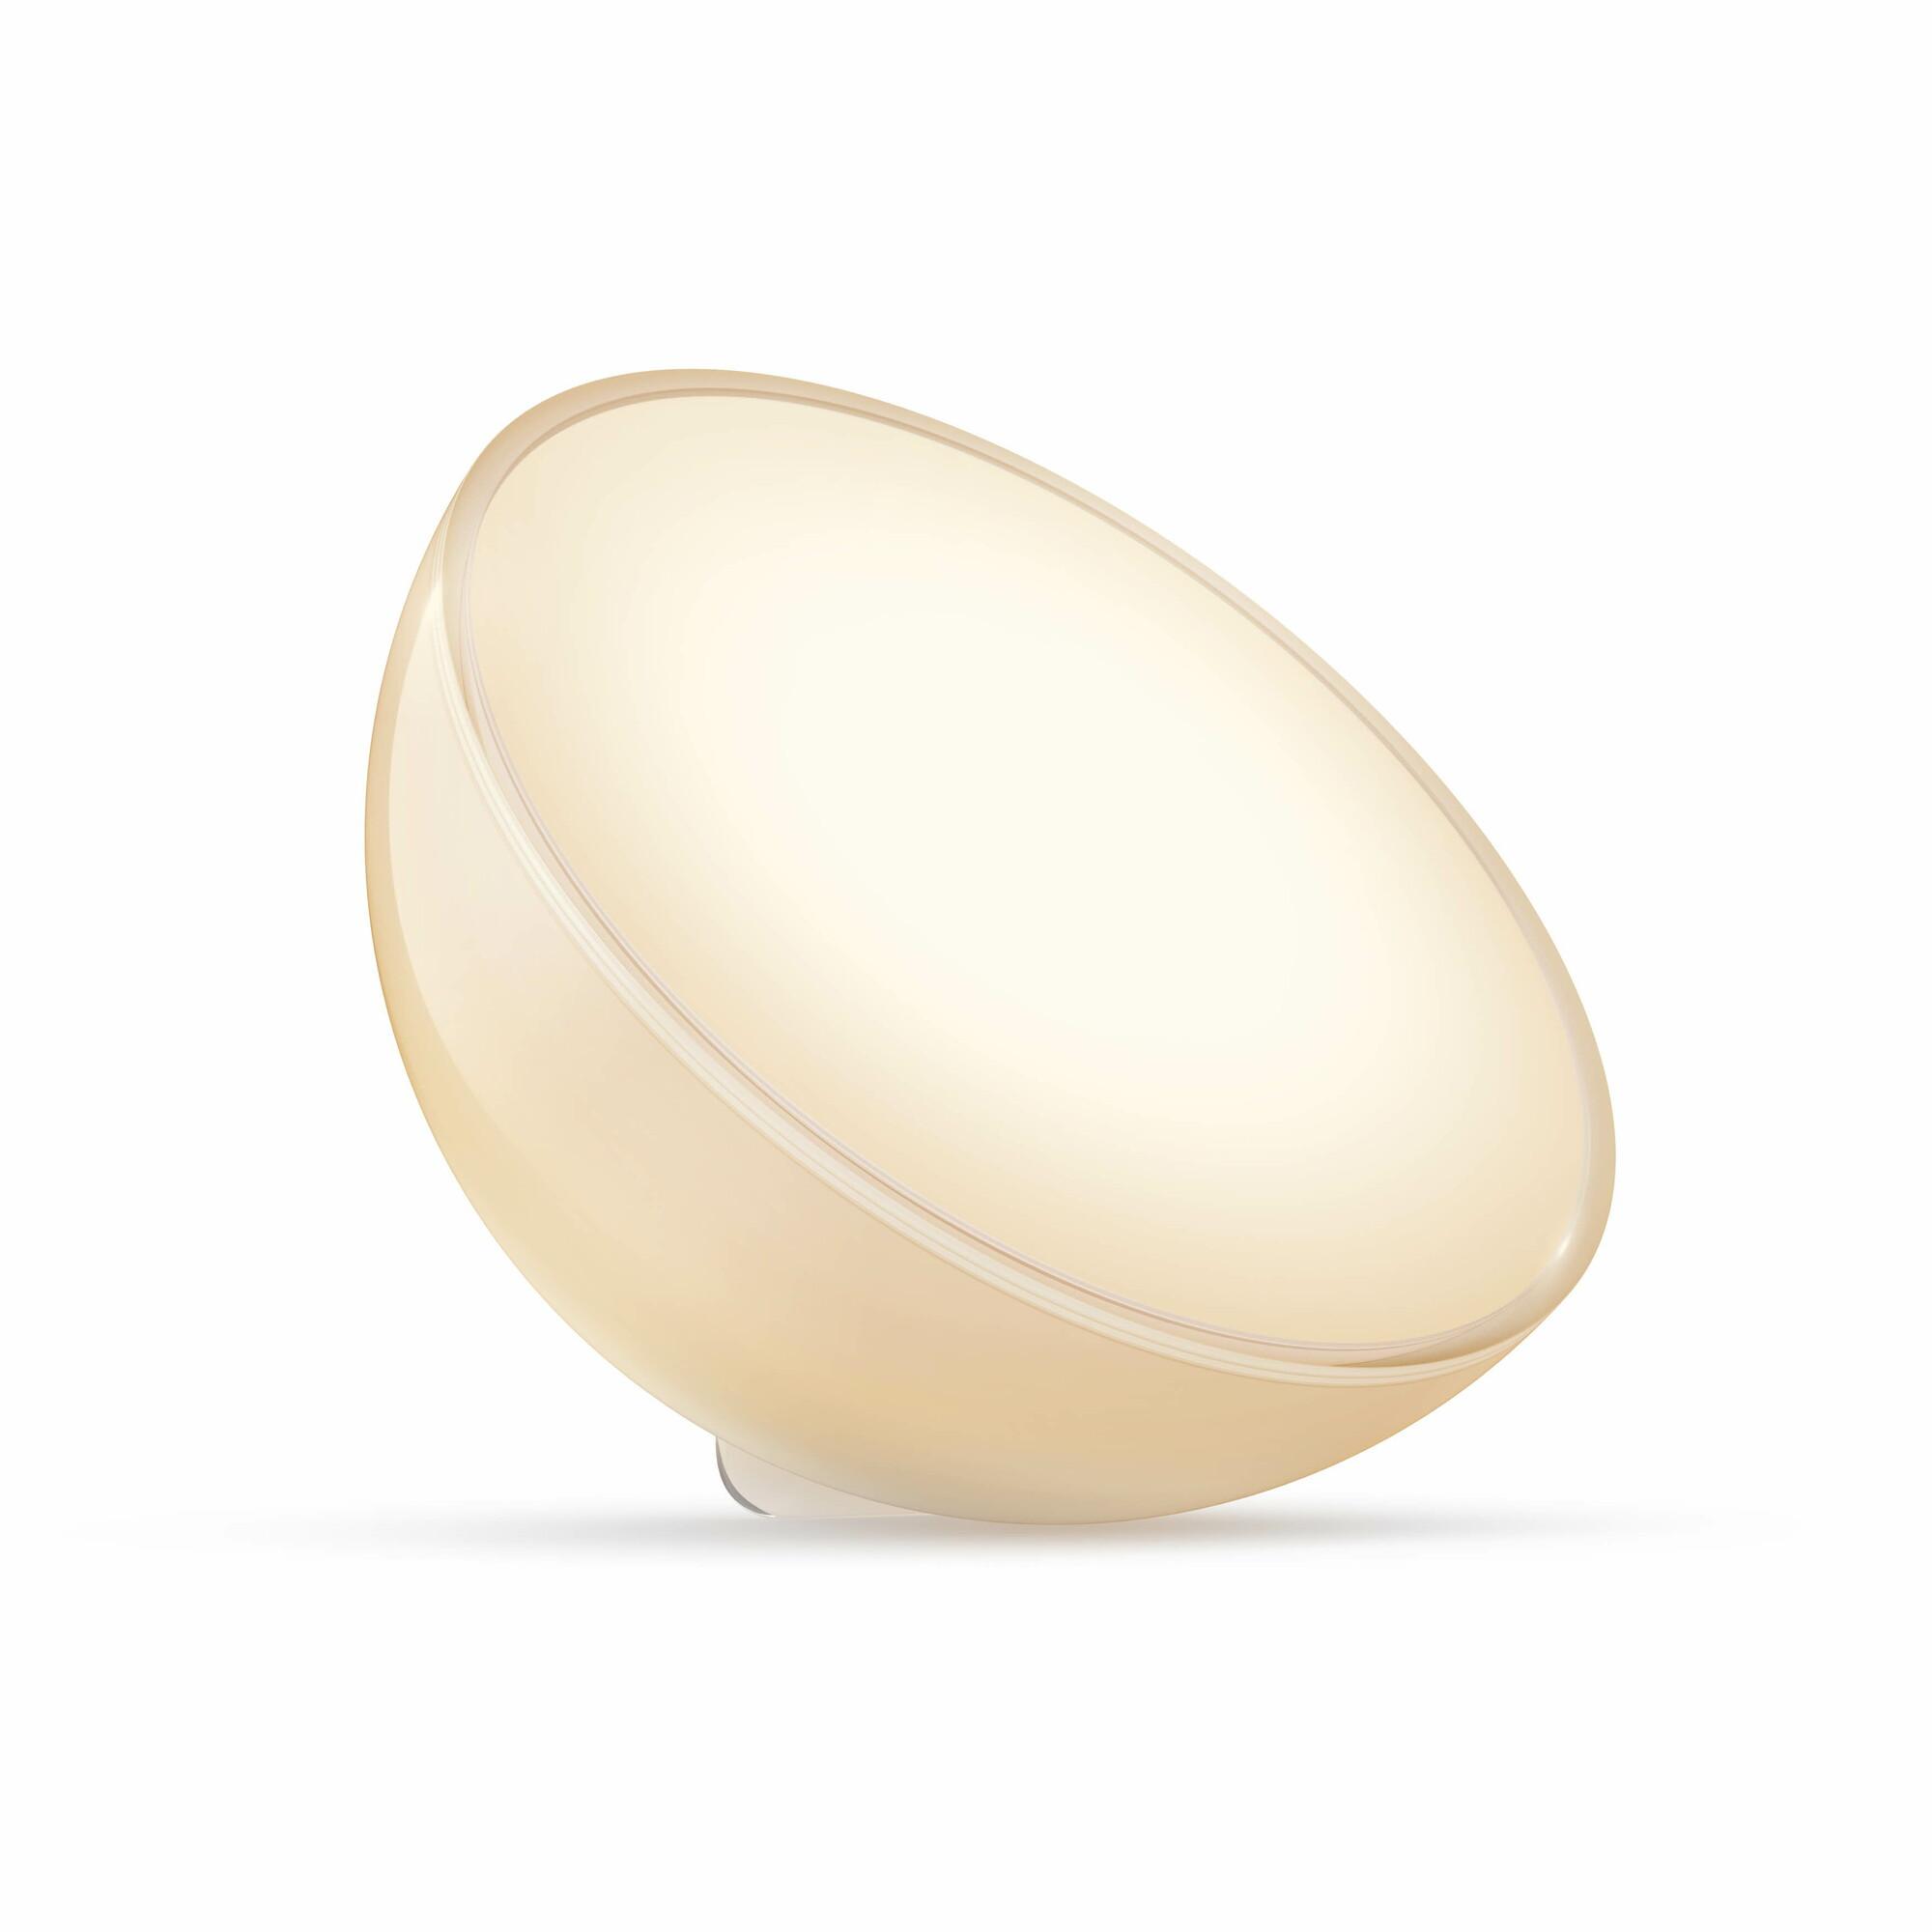 Philips HUE GO Lampe de table LED 1x6W/520lm Blanc